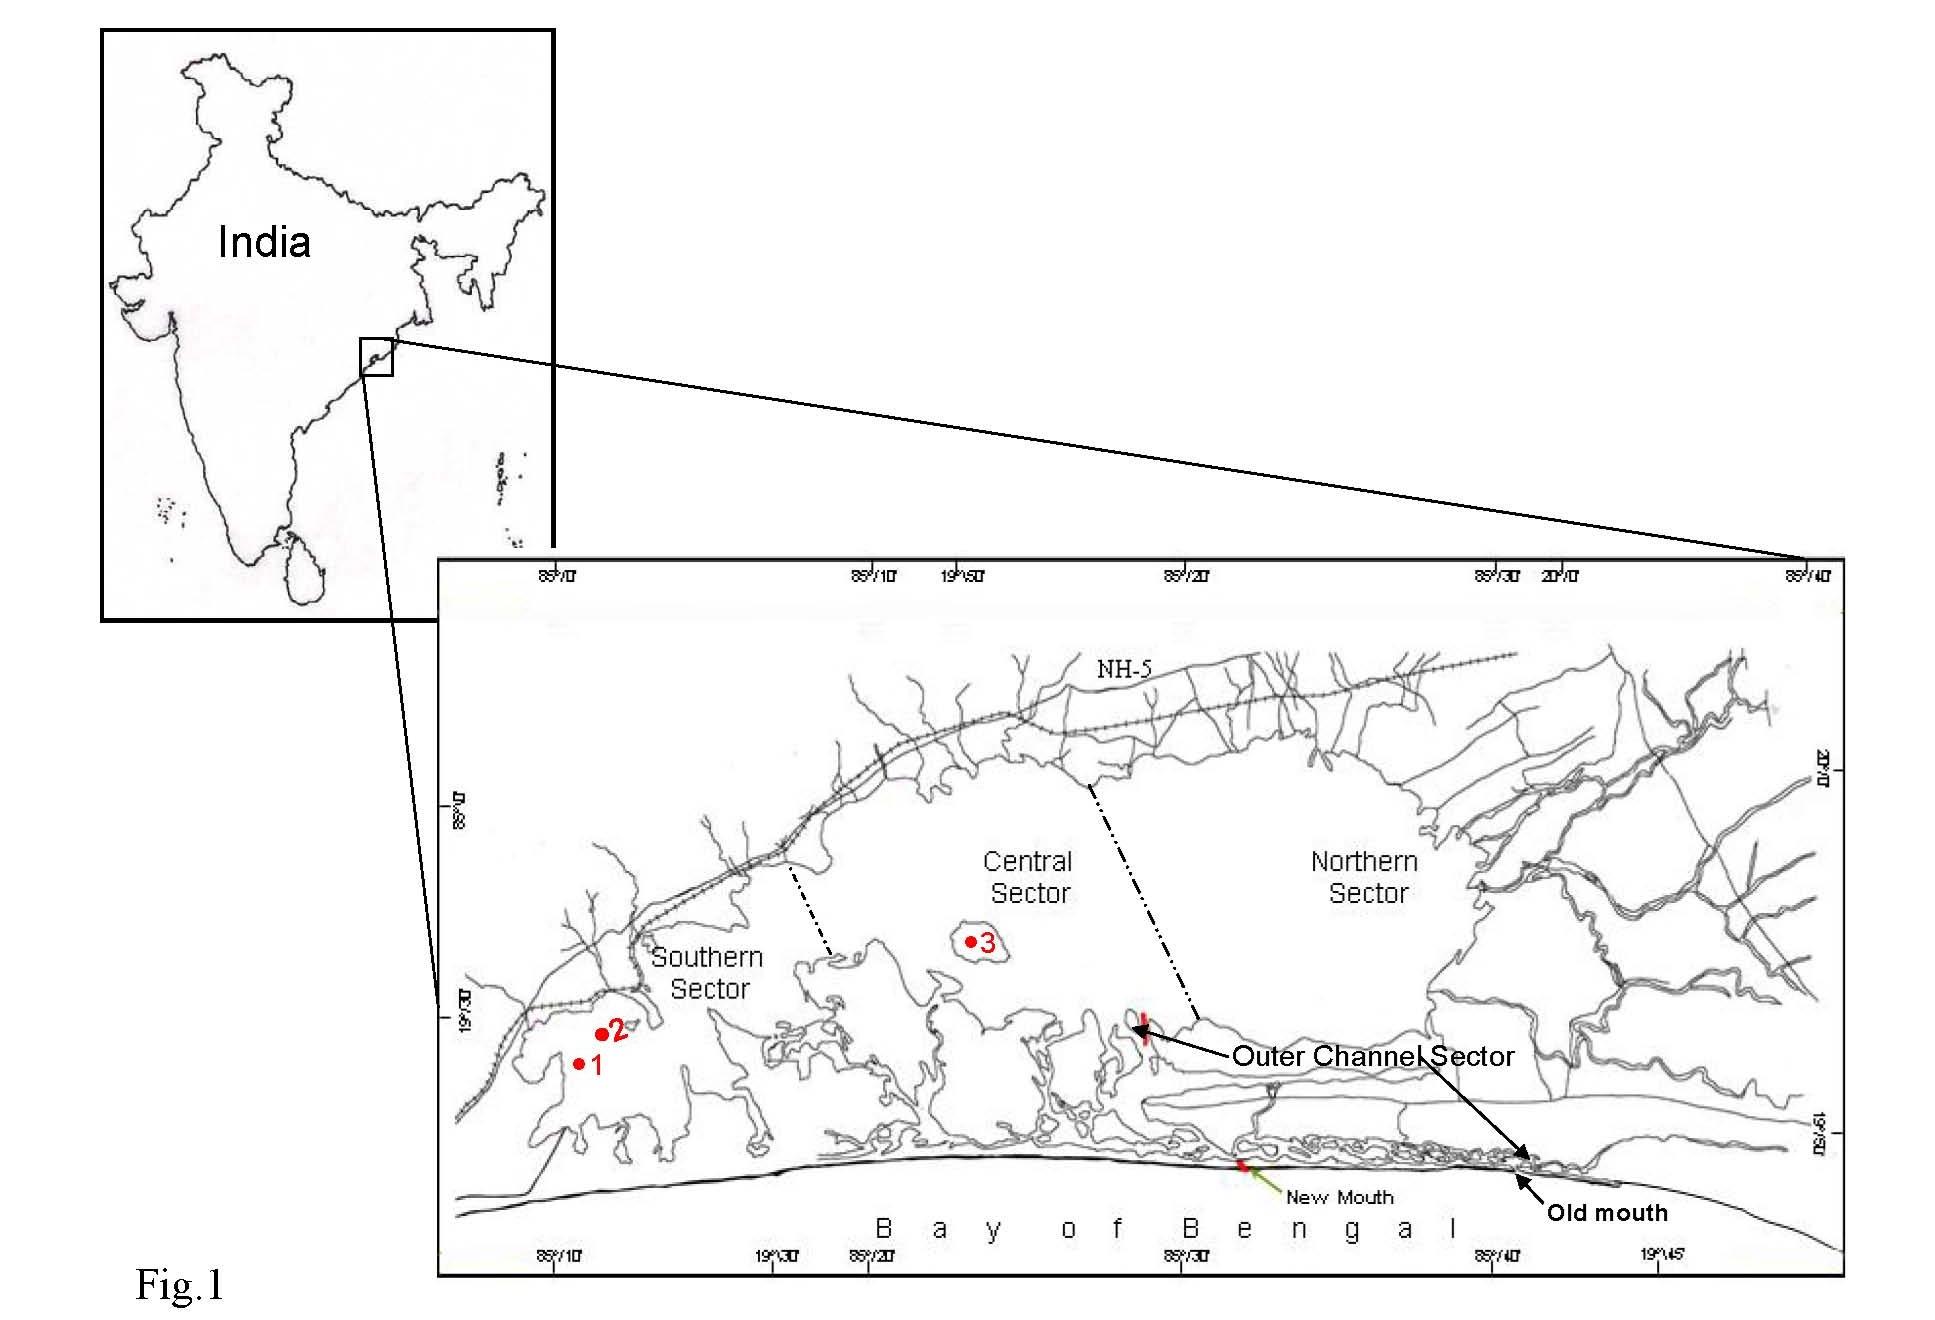 Location map of Chilika lagoon showing collection sites. 1. Bird's Island, 2. Honeymoon Island and 3.Kalijai.